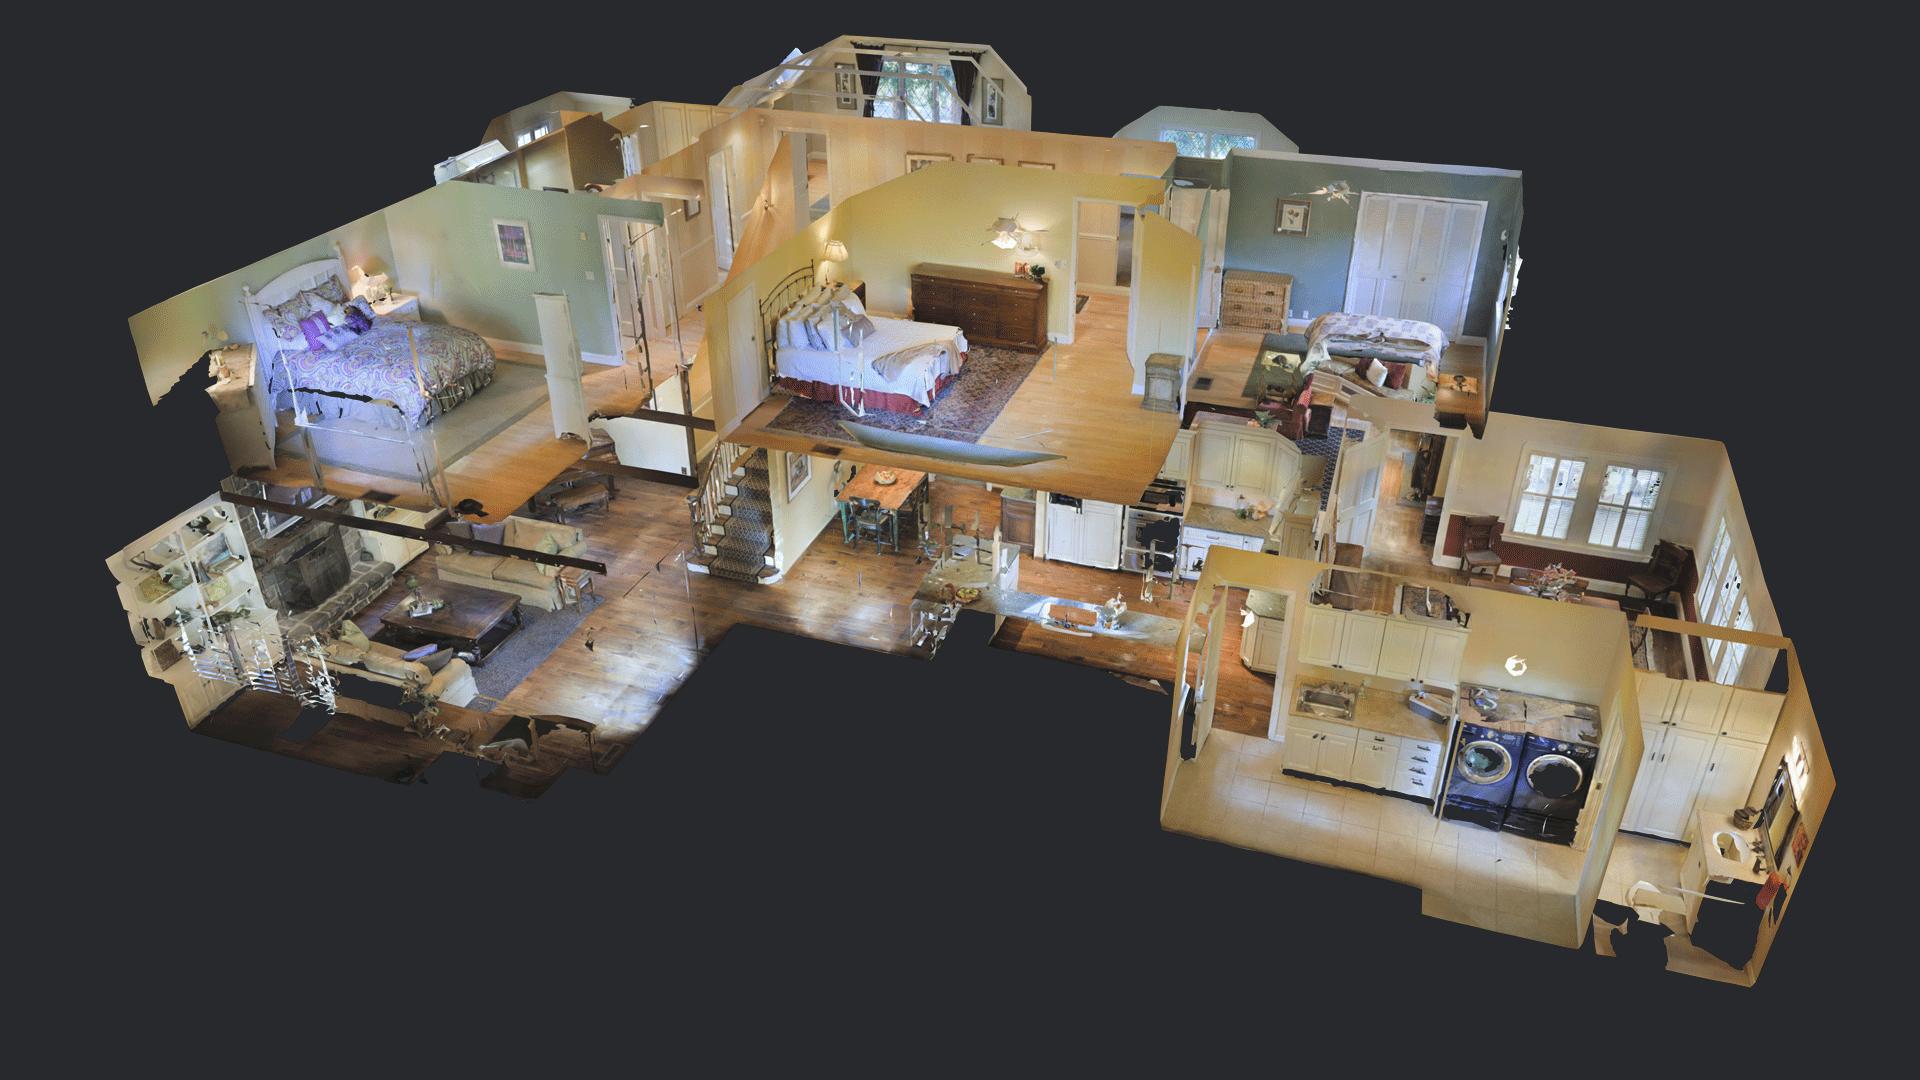 macheta tridimensionala tur virtual 3d